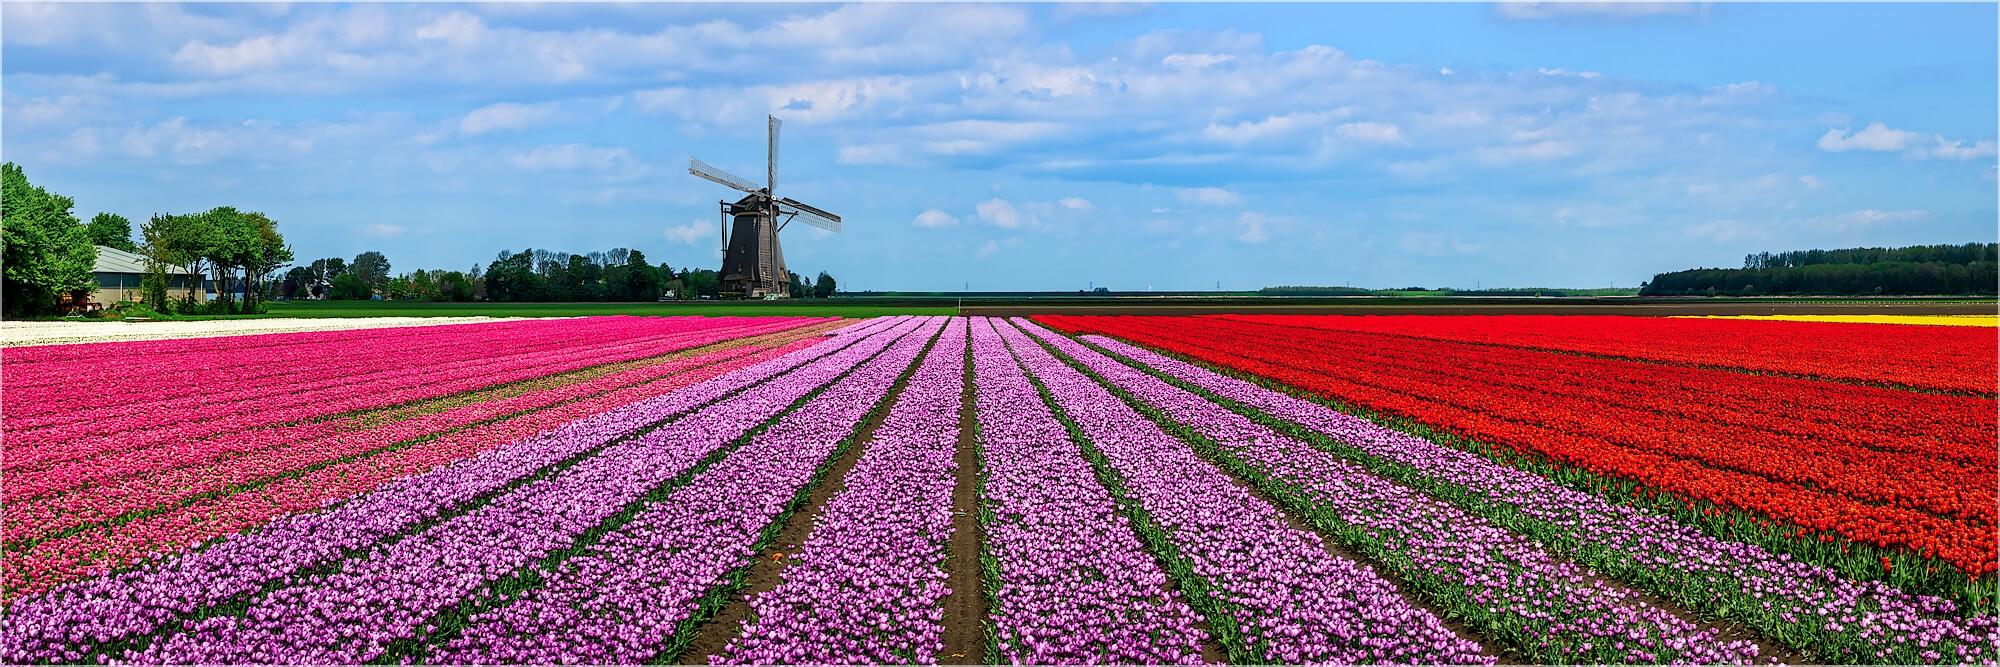 Panoramabild Tulpenfelder in Holland